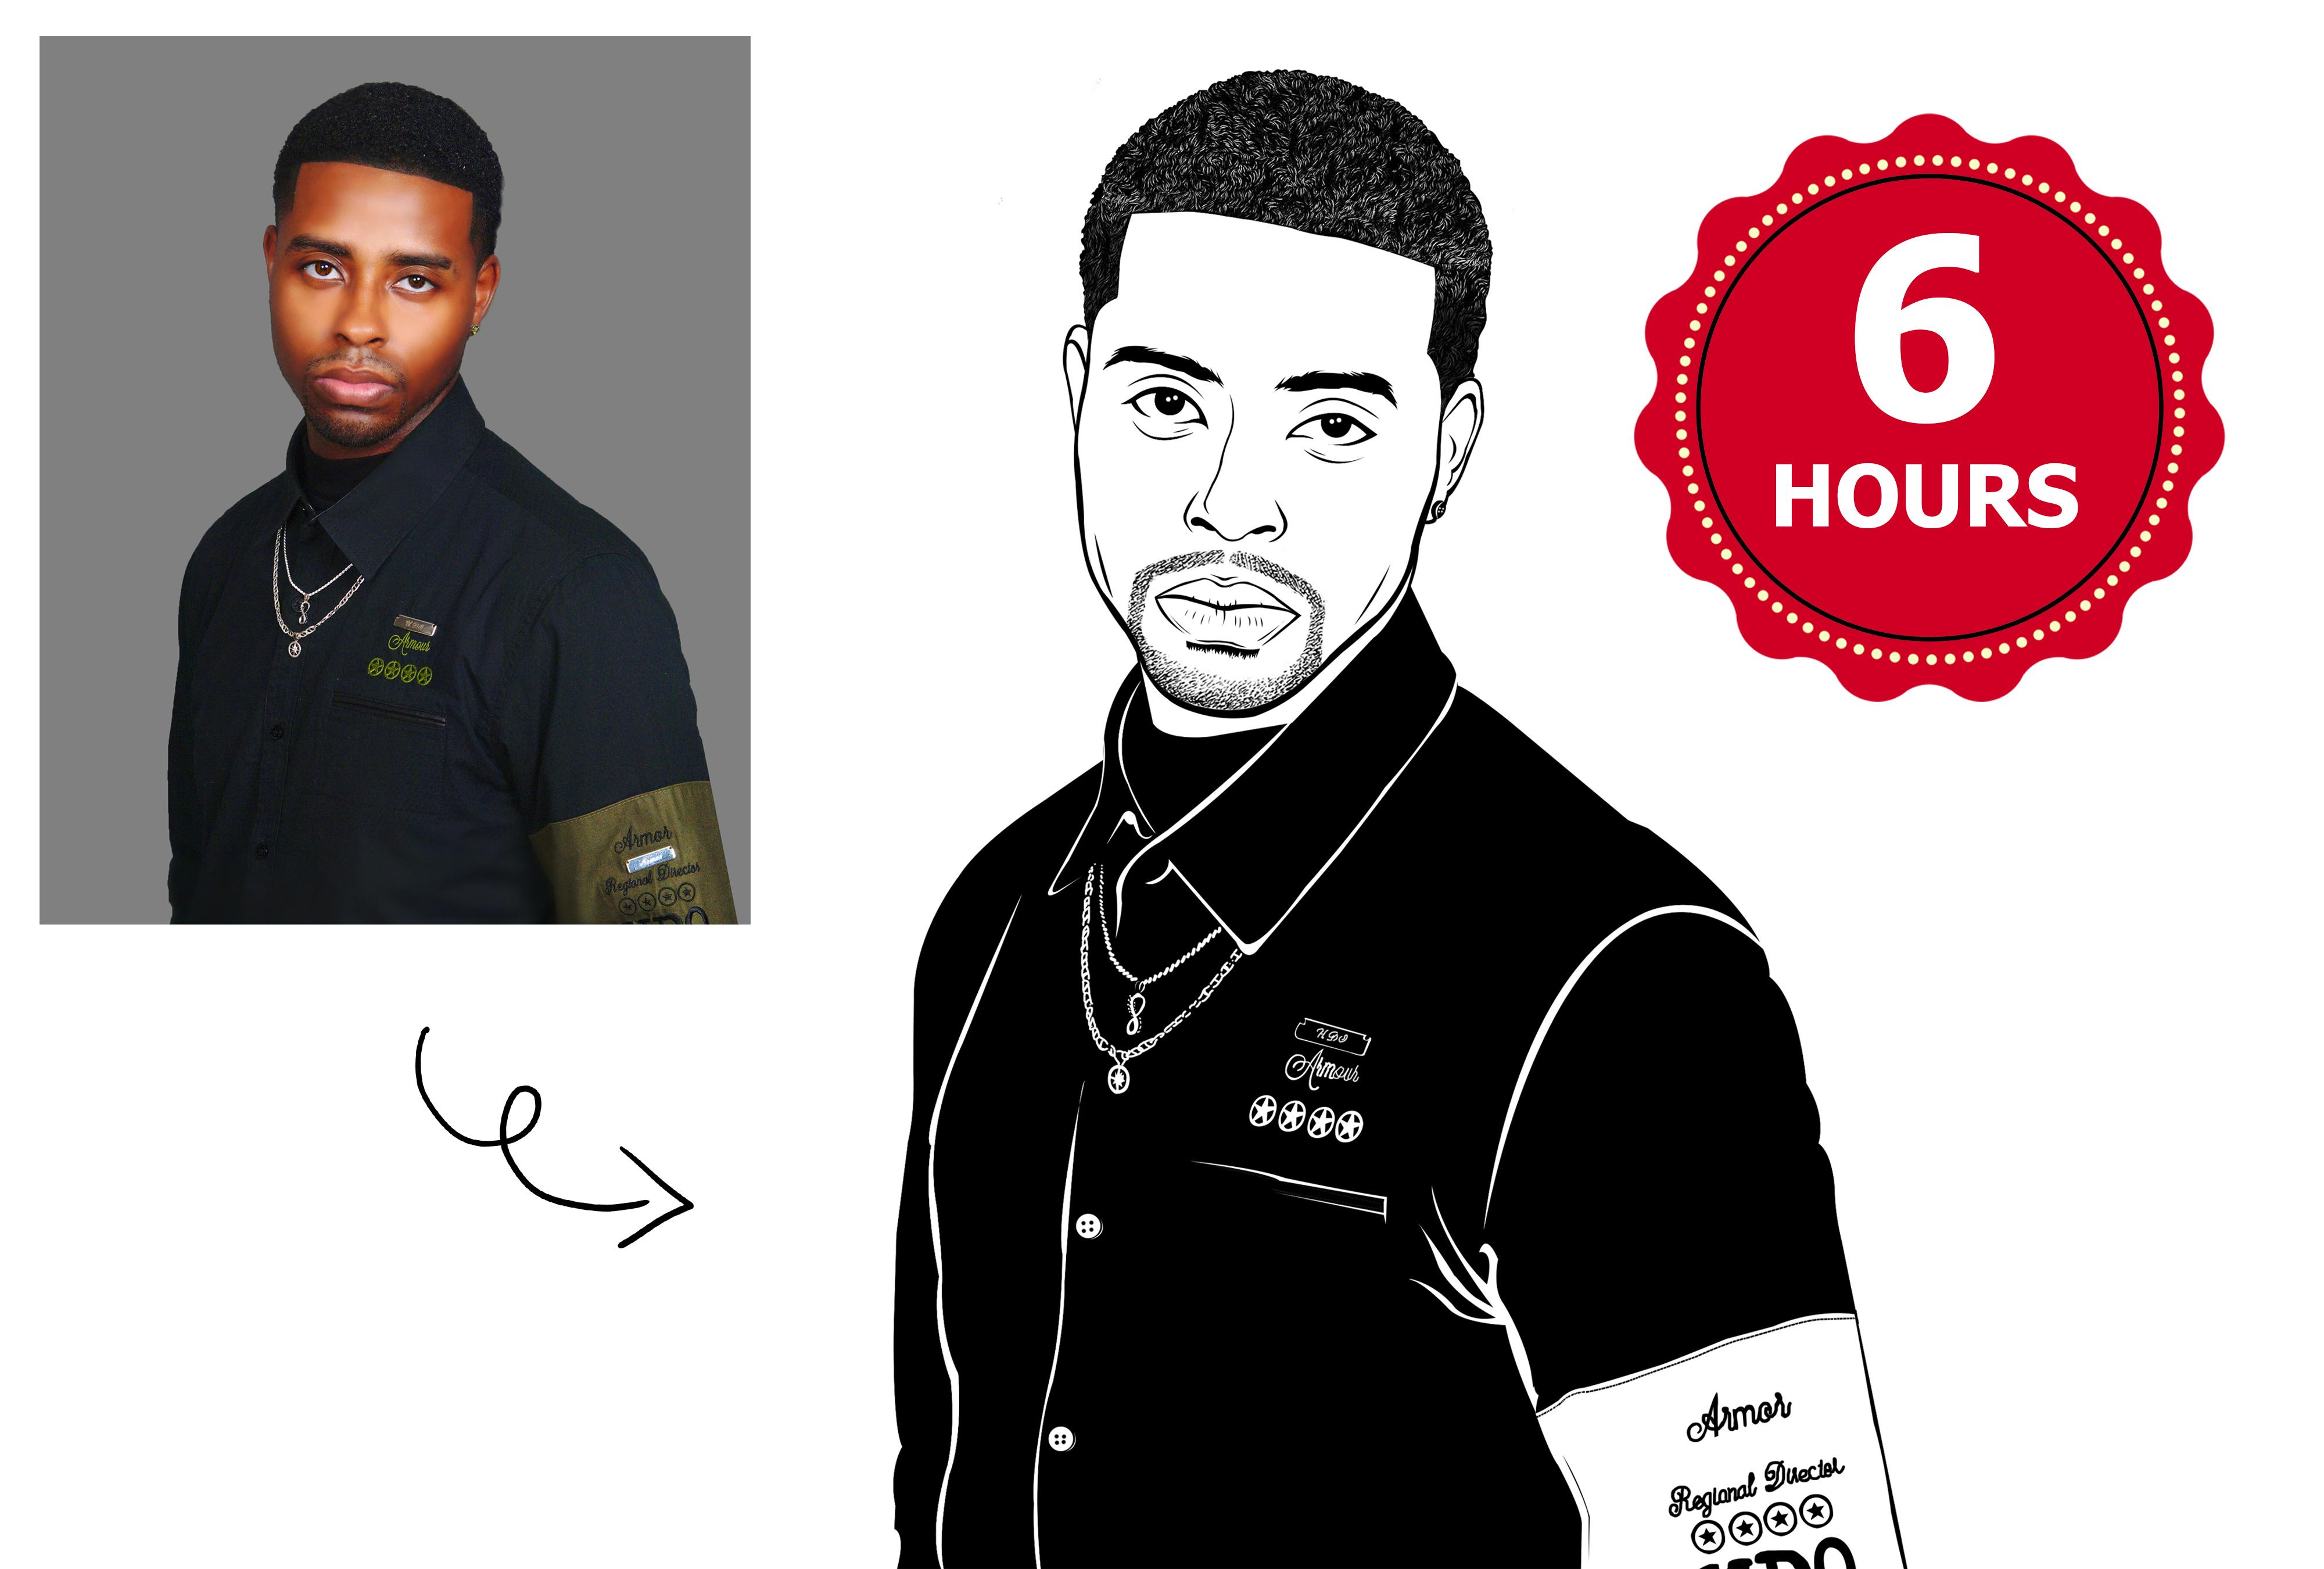 Draw Line Art Illustration Of Your Photo